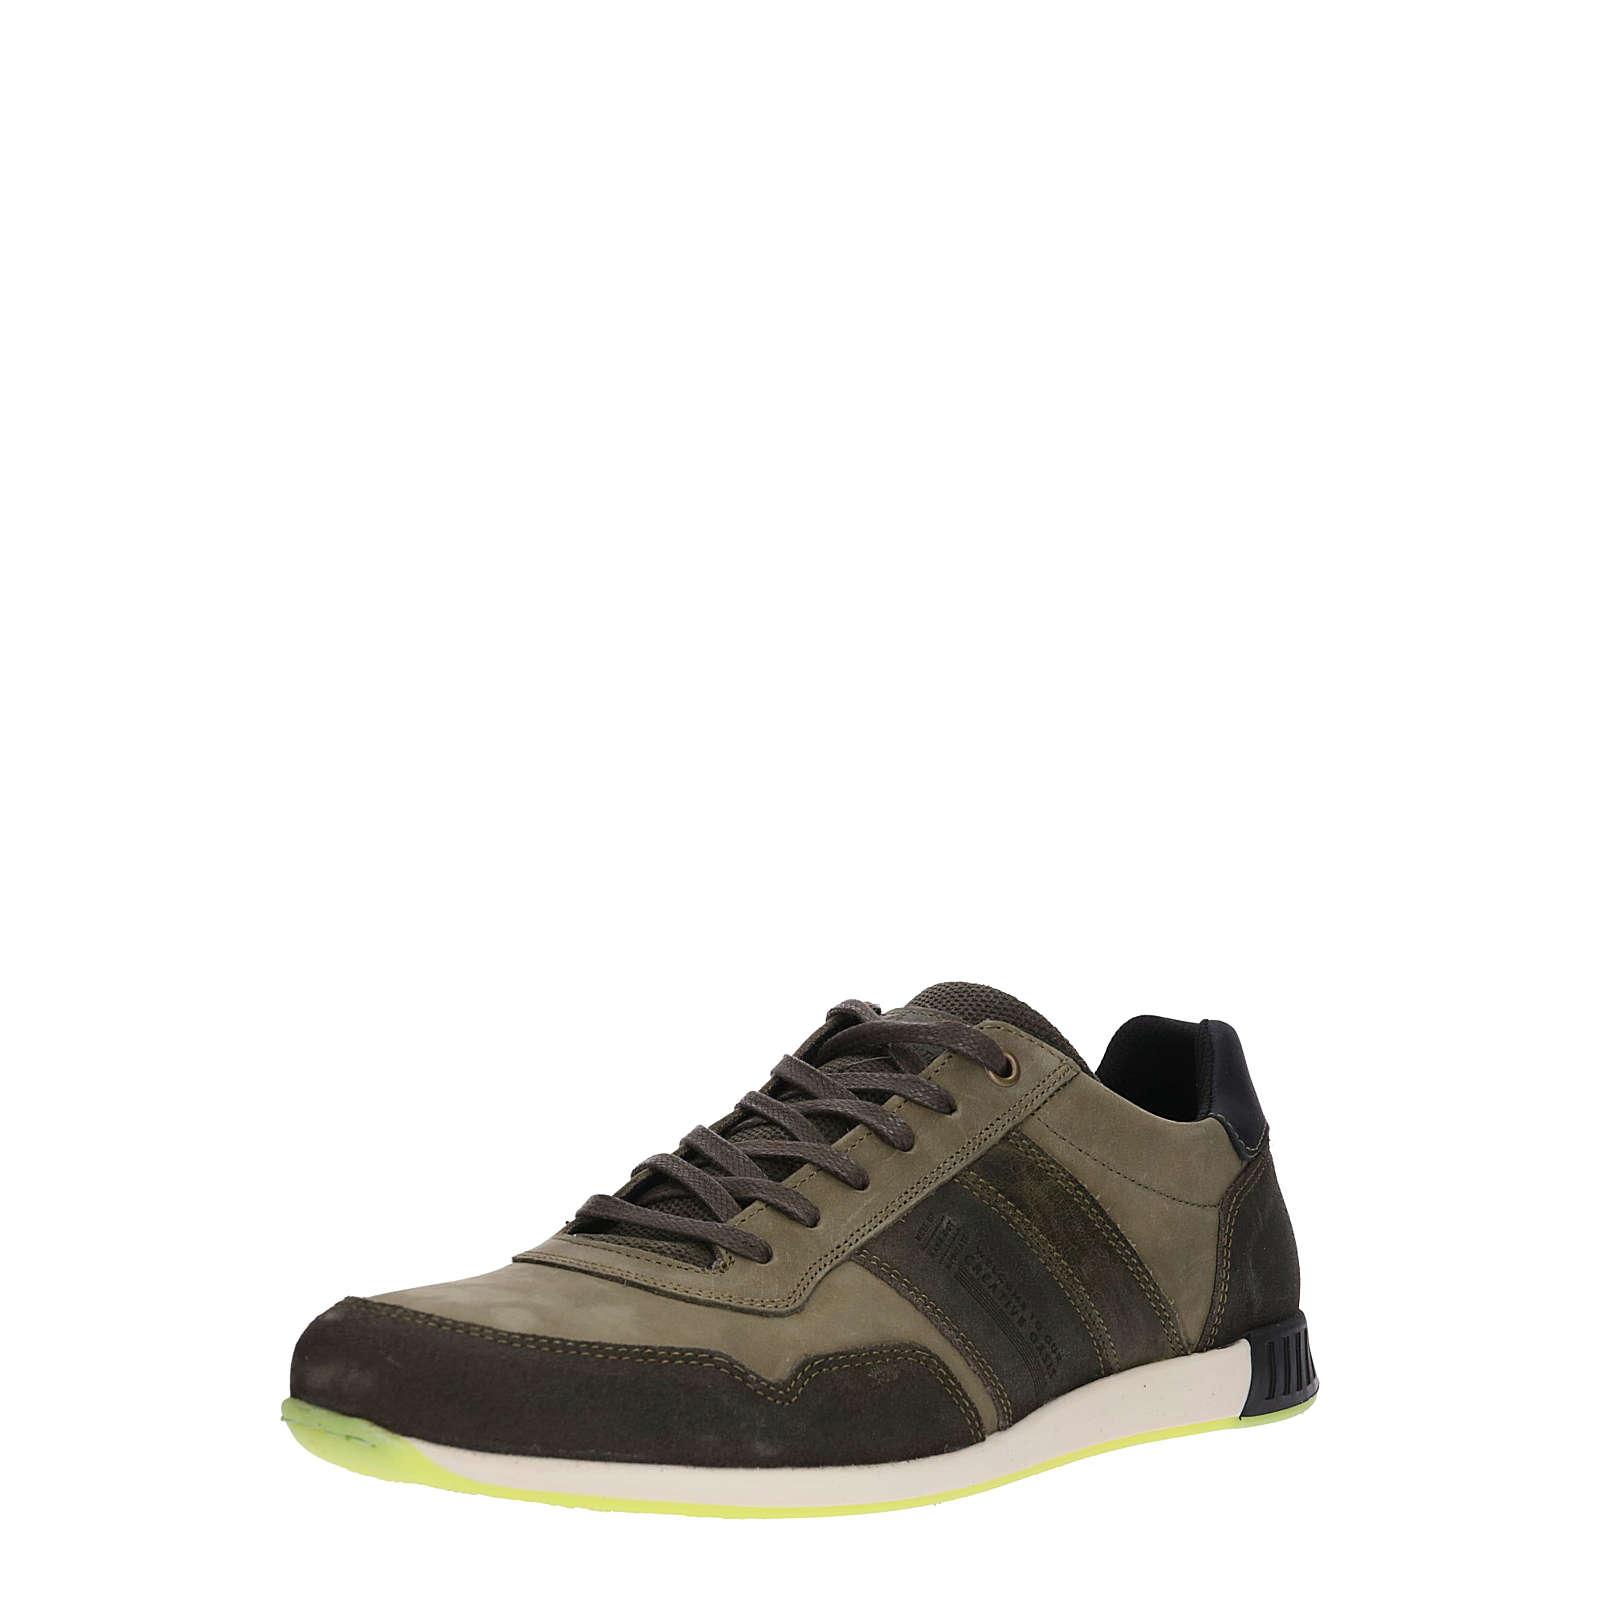 BULLBOXER Sneaker low Sneakers Low oliv Herren Gr. 41